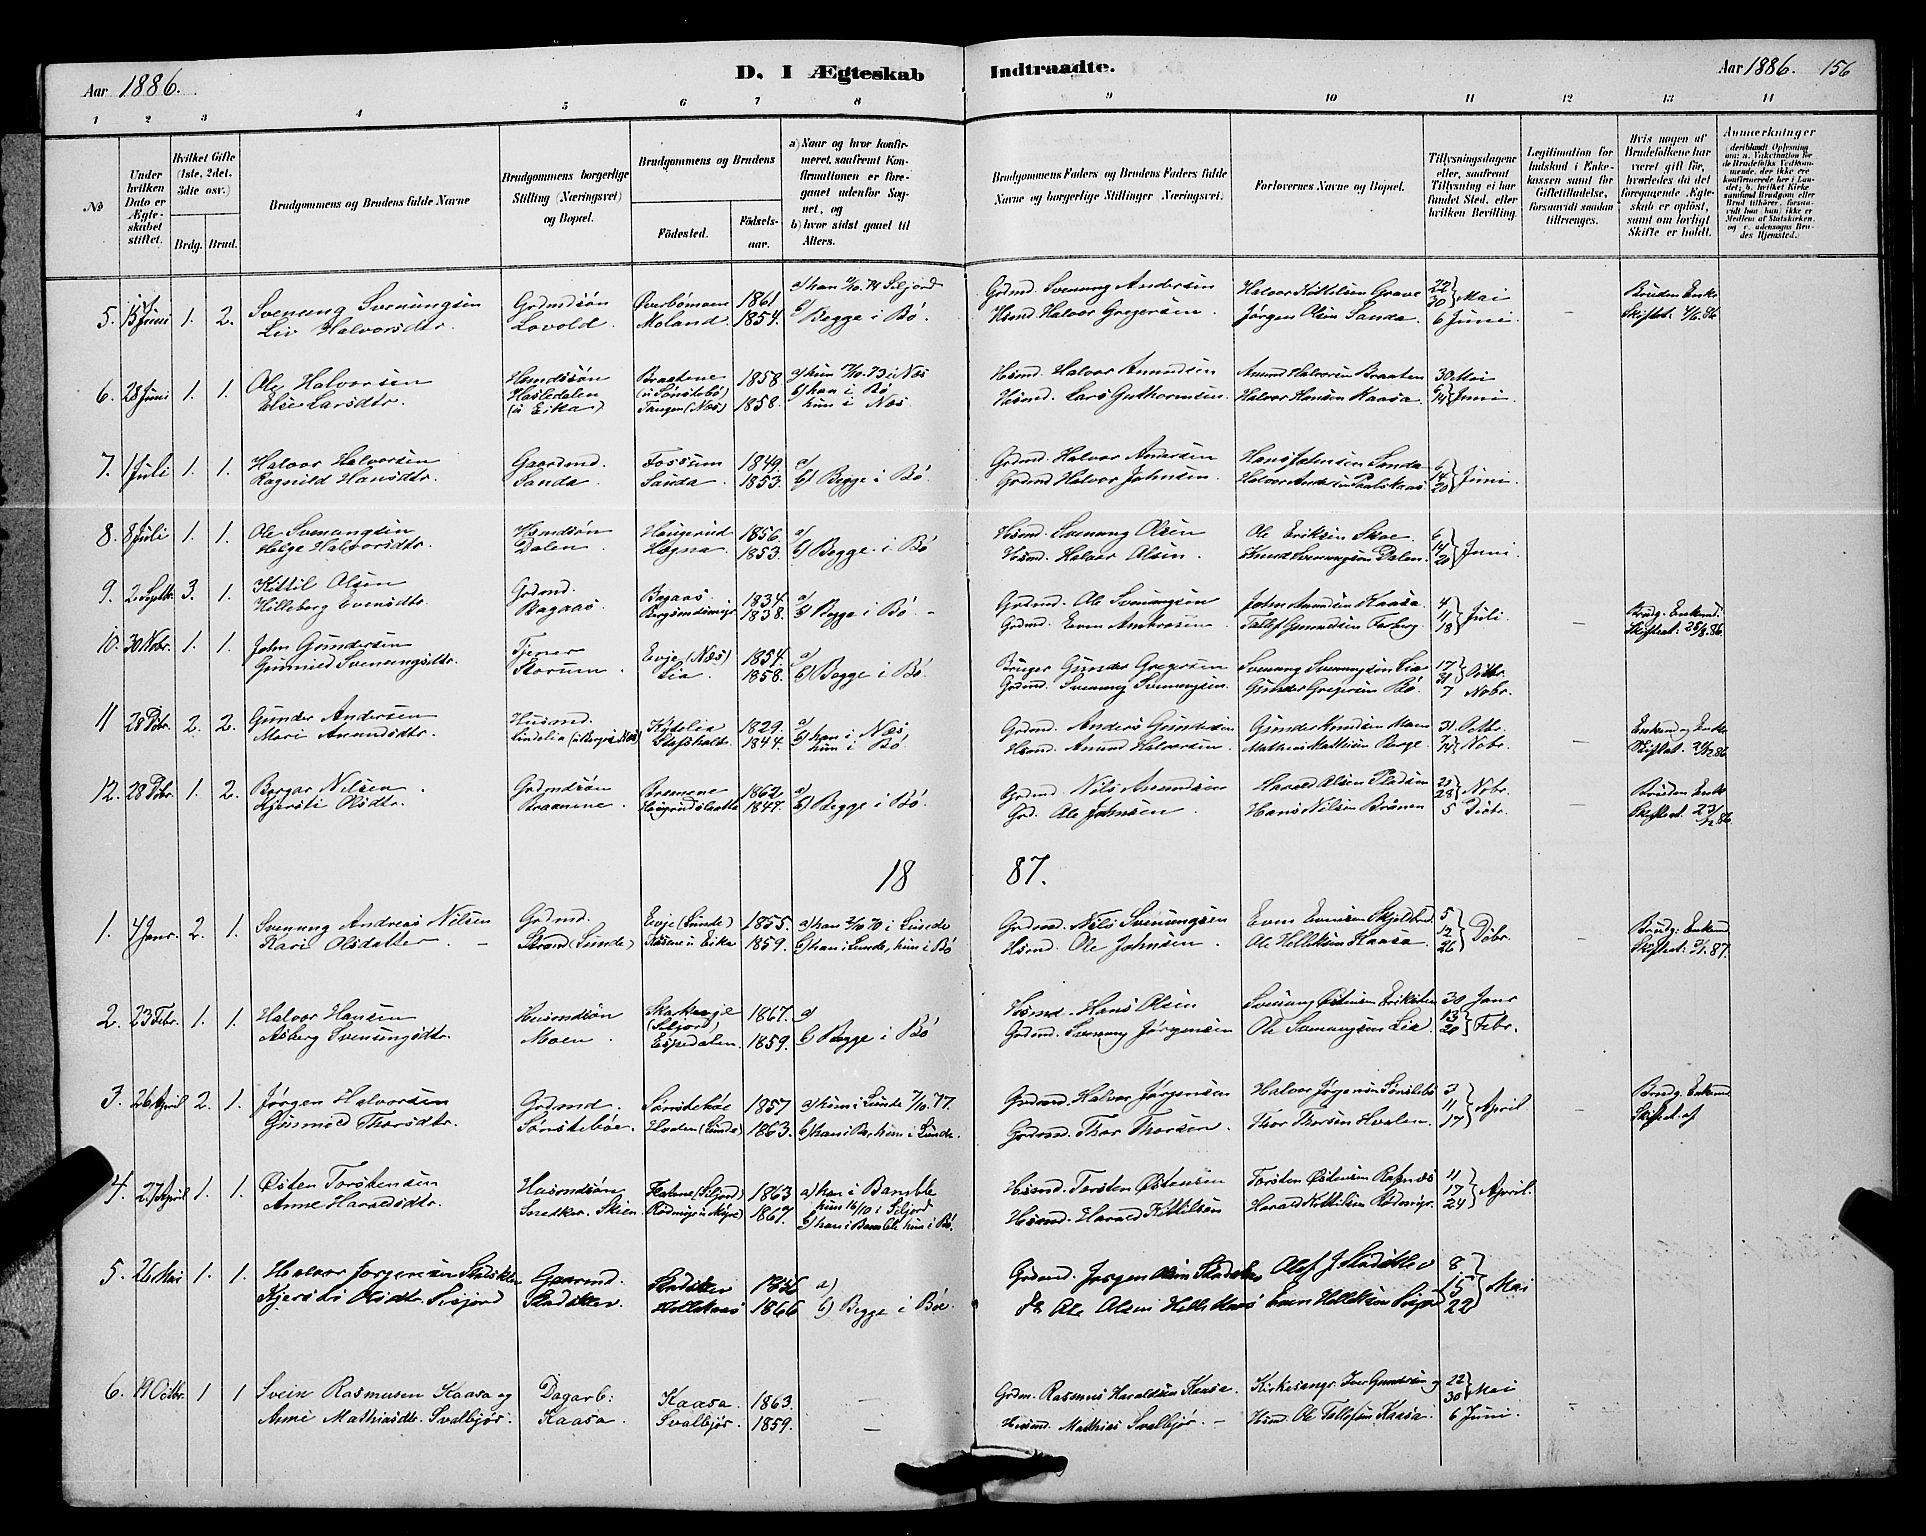 SAKO, Bø kirkebøker, G/Ga/L0005: Klokkerbok nr. 5, 1883-1897, s. 156